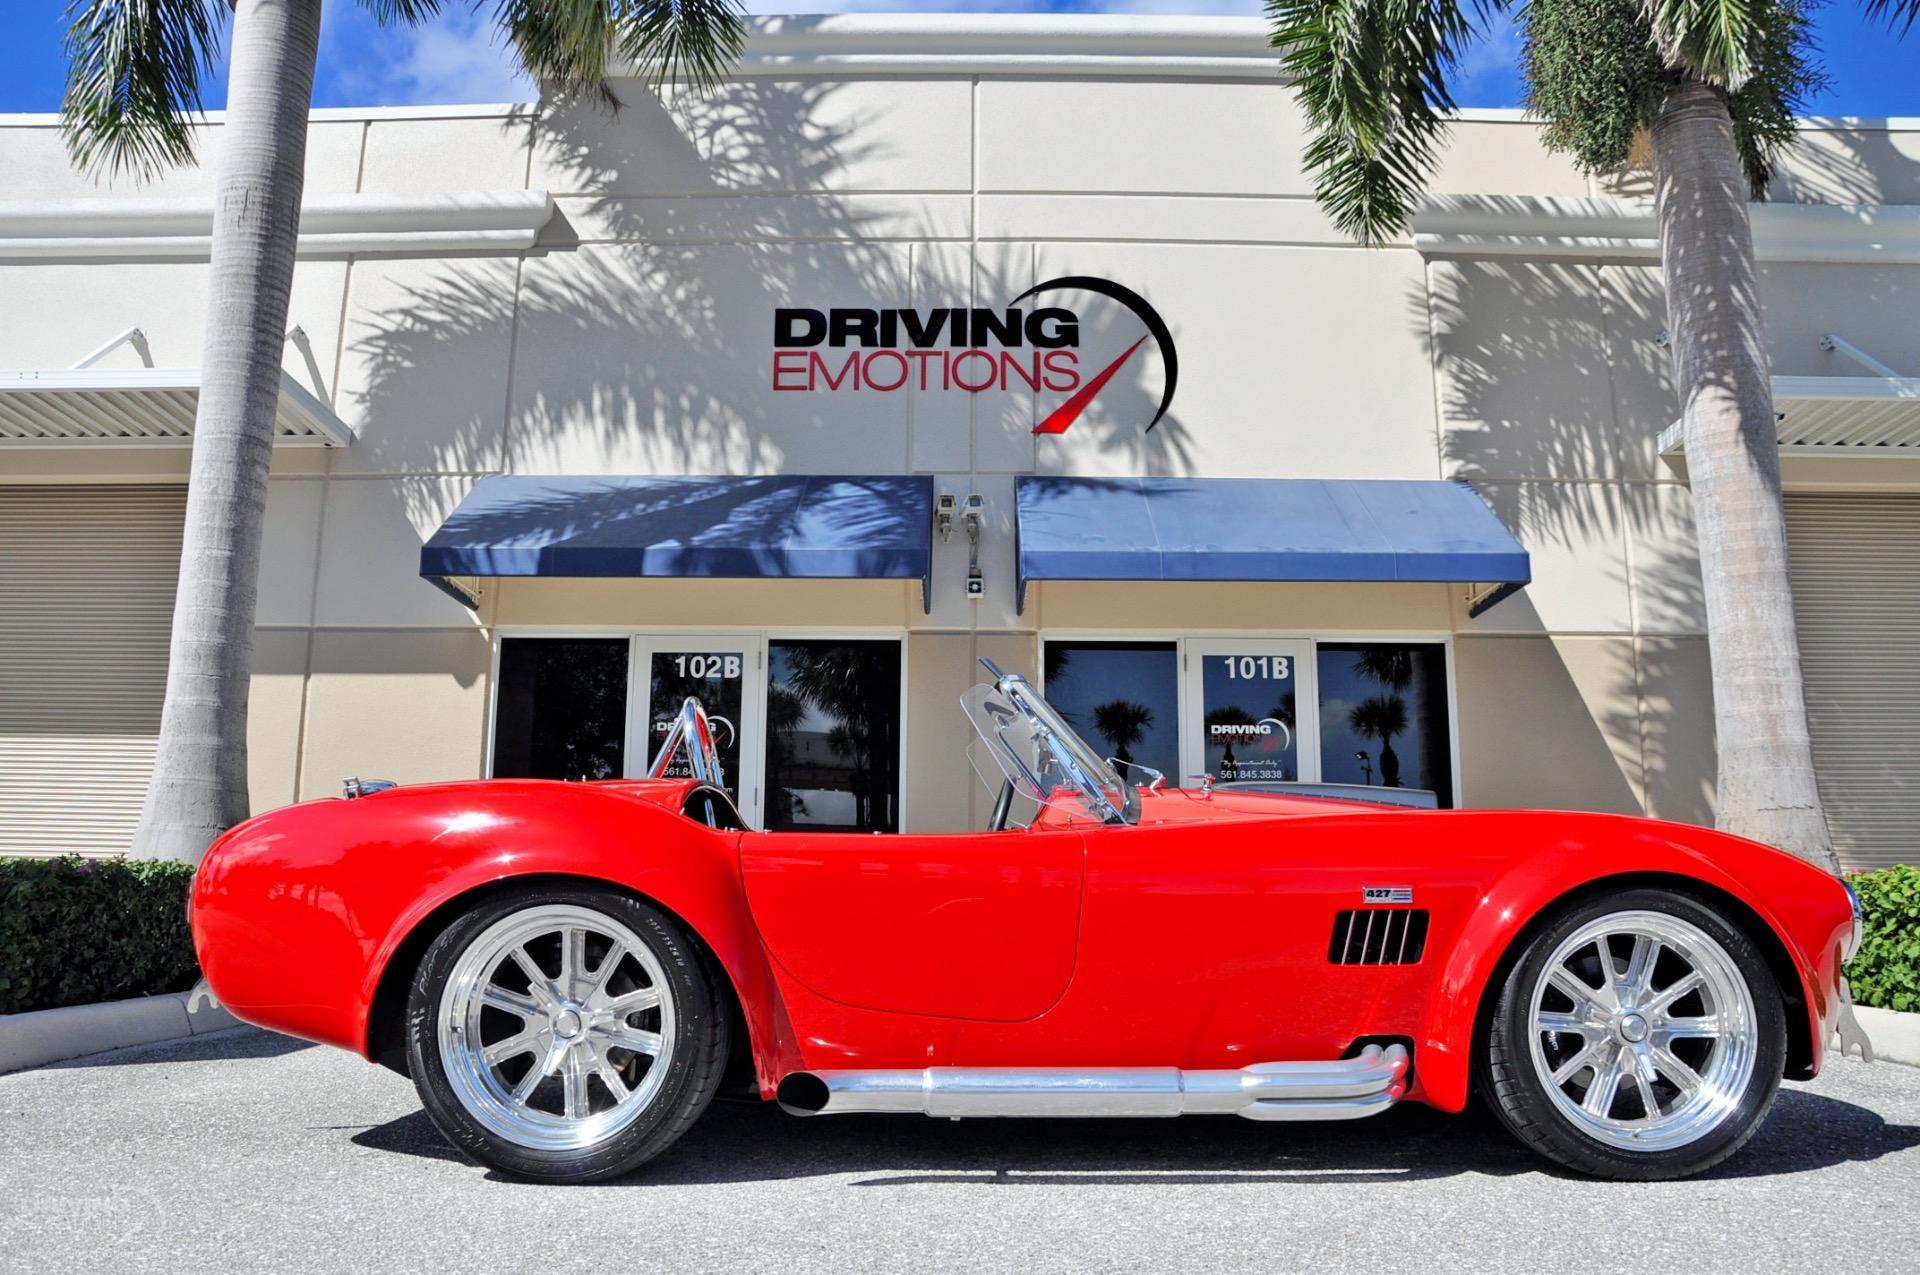 Used 1965 Superformance MKIII Cobra Superformance Shelby Cobra Replica | Lake Park, FL